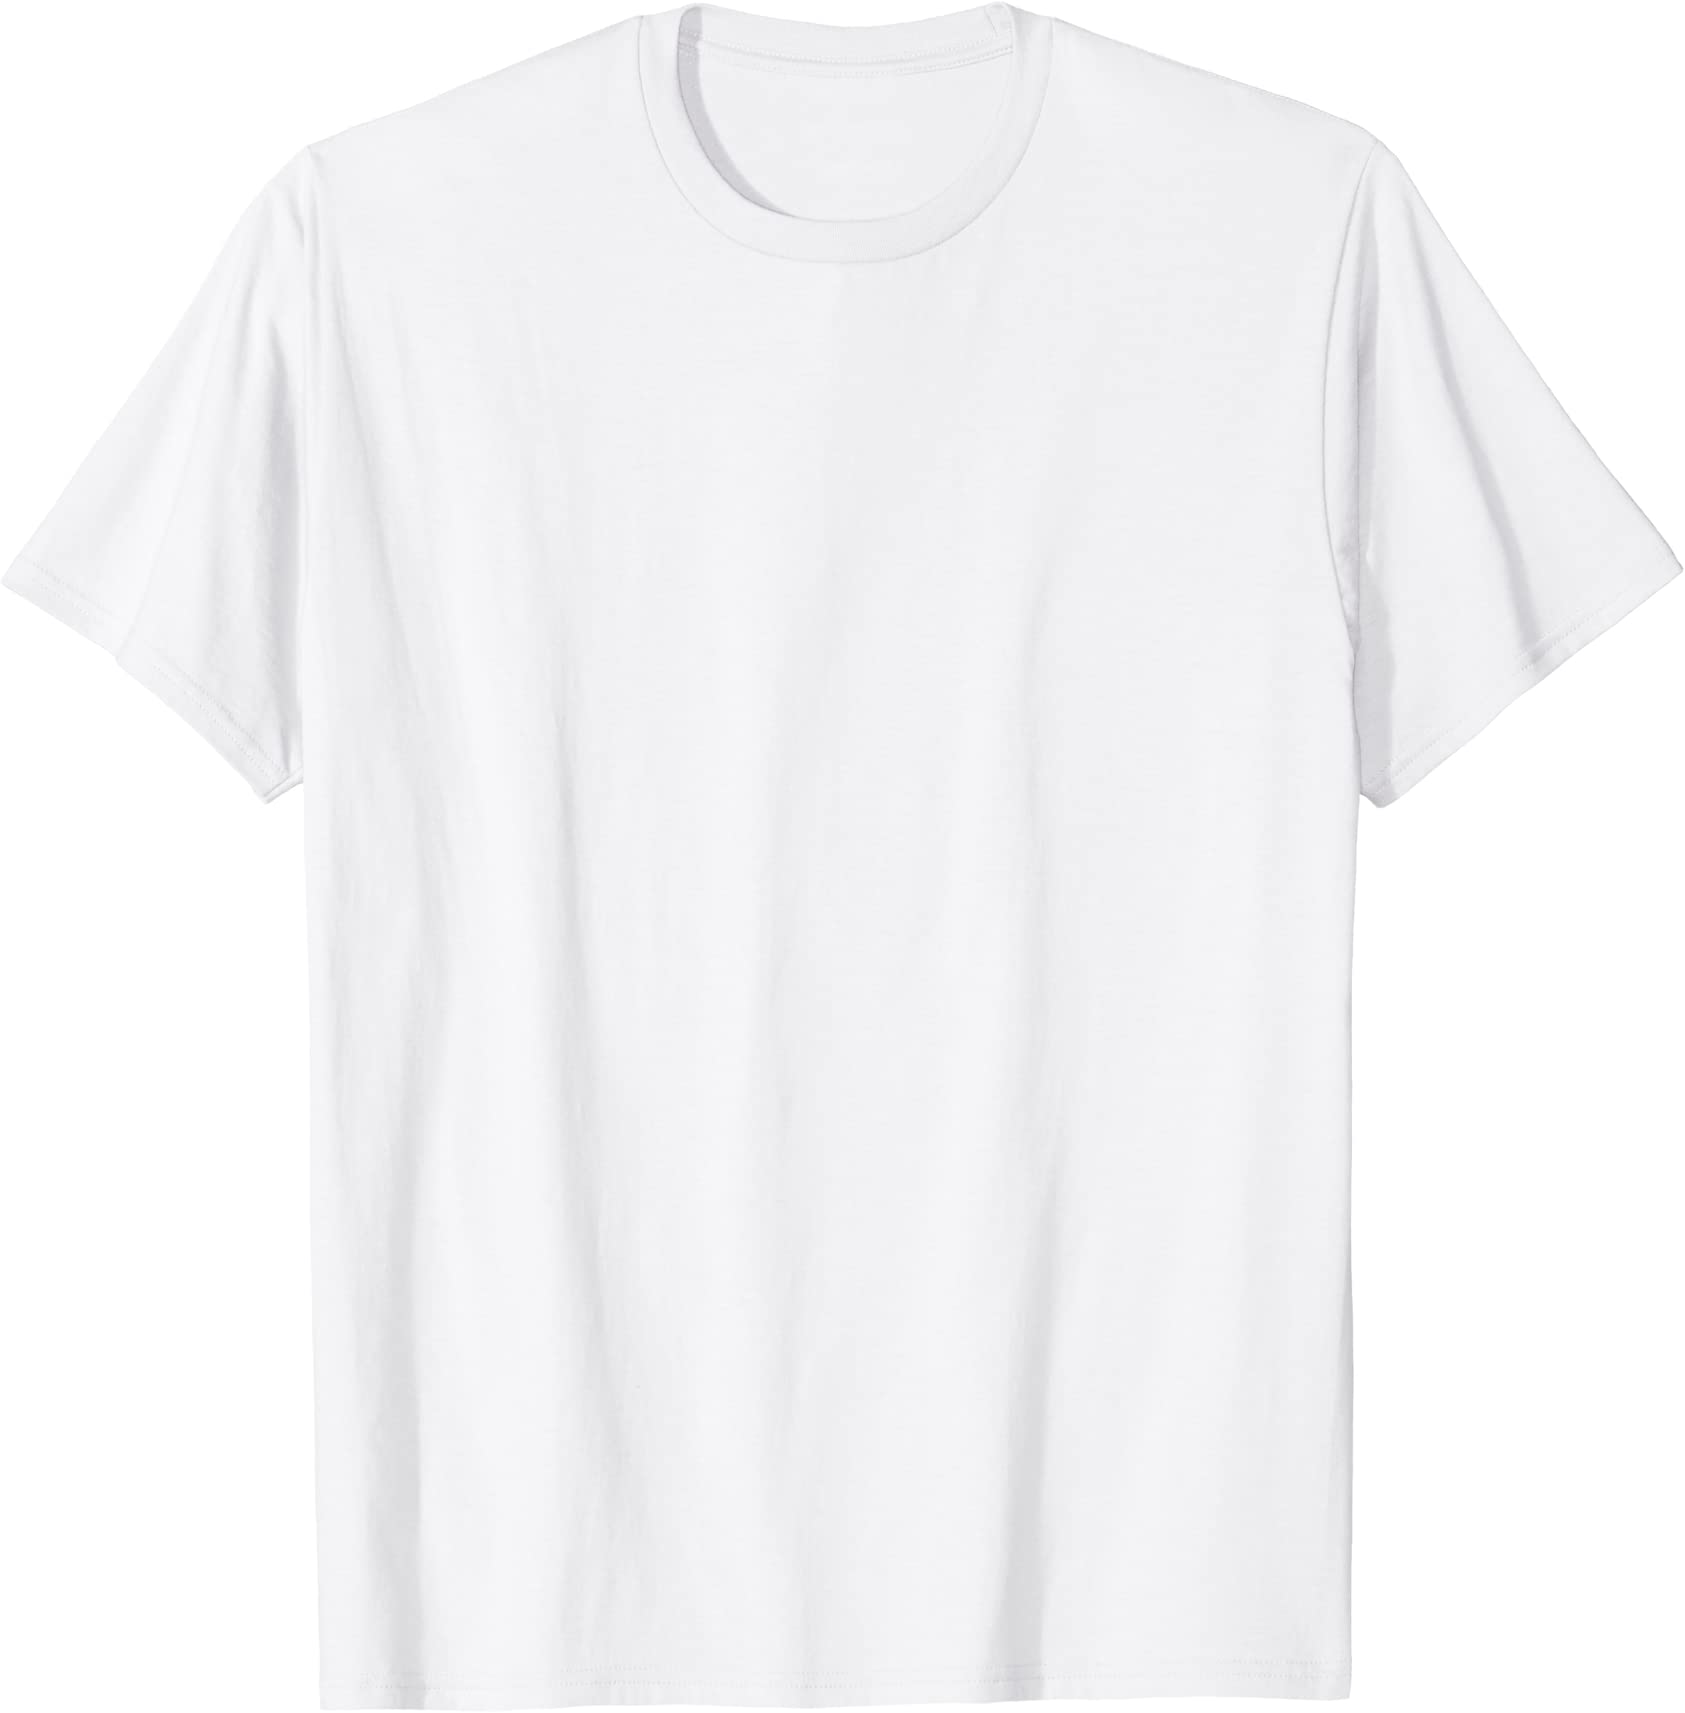 Activation T-Shirt Women XXL 7th Seal Activator